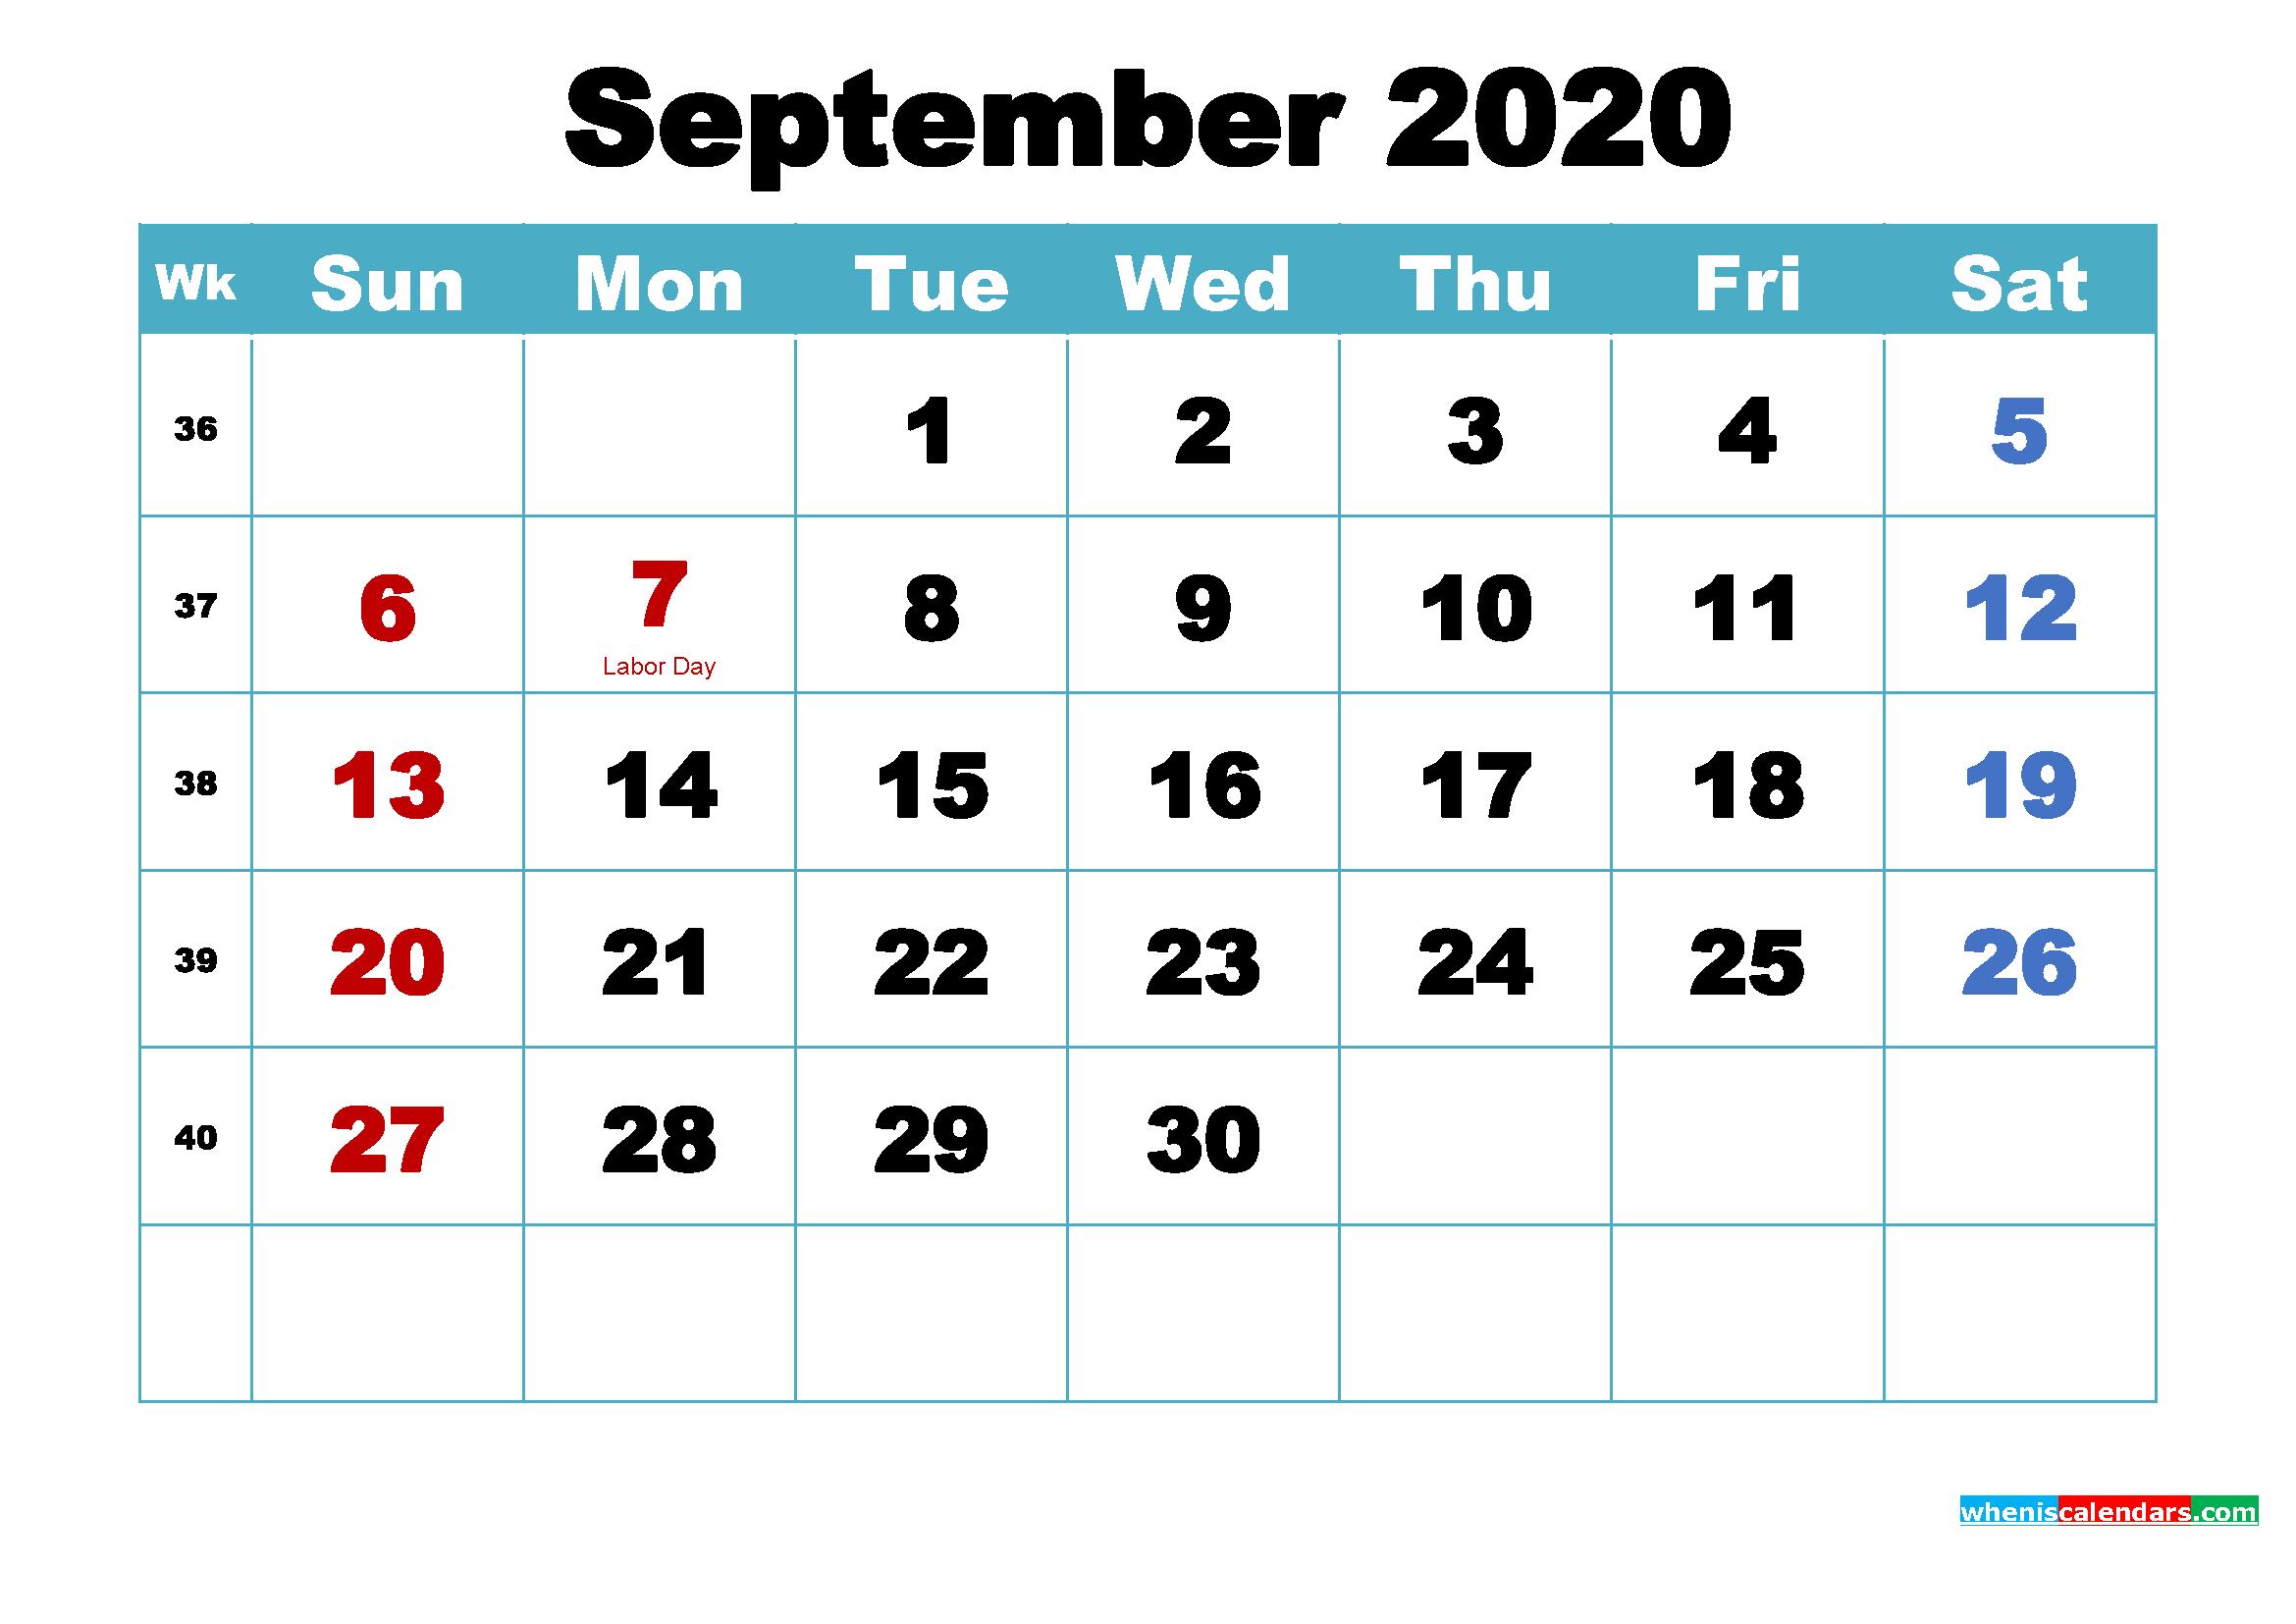 September 2020 Calendar Wallpaper Free Download